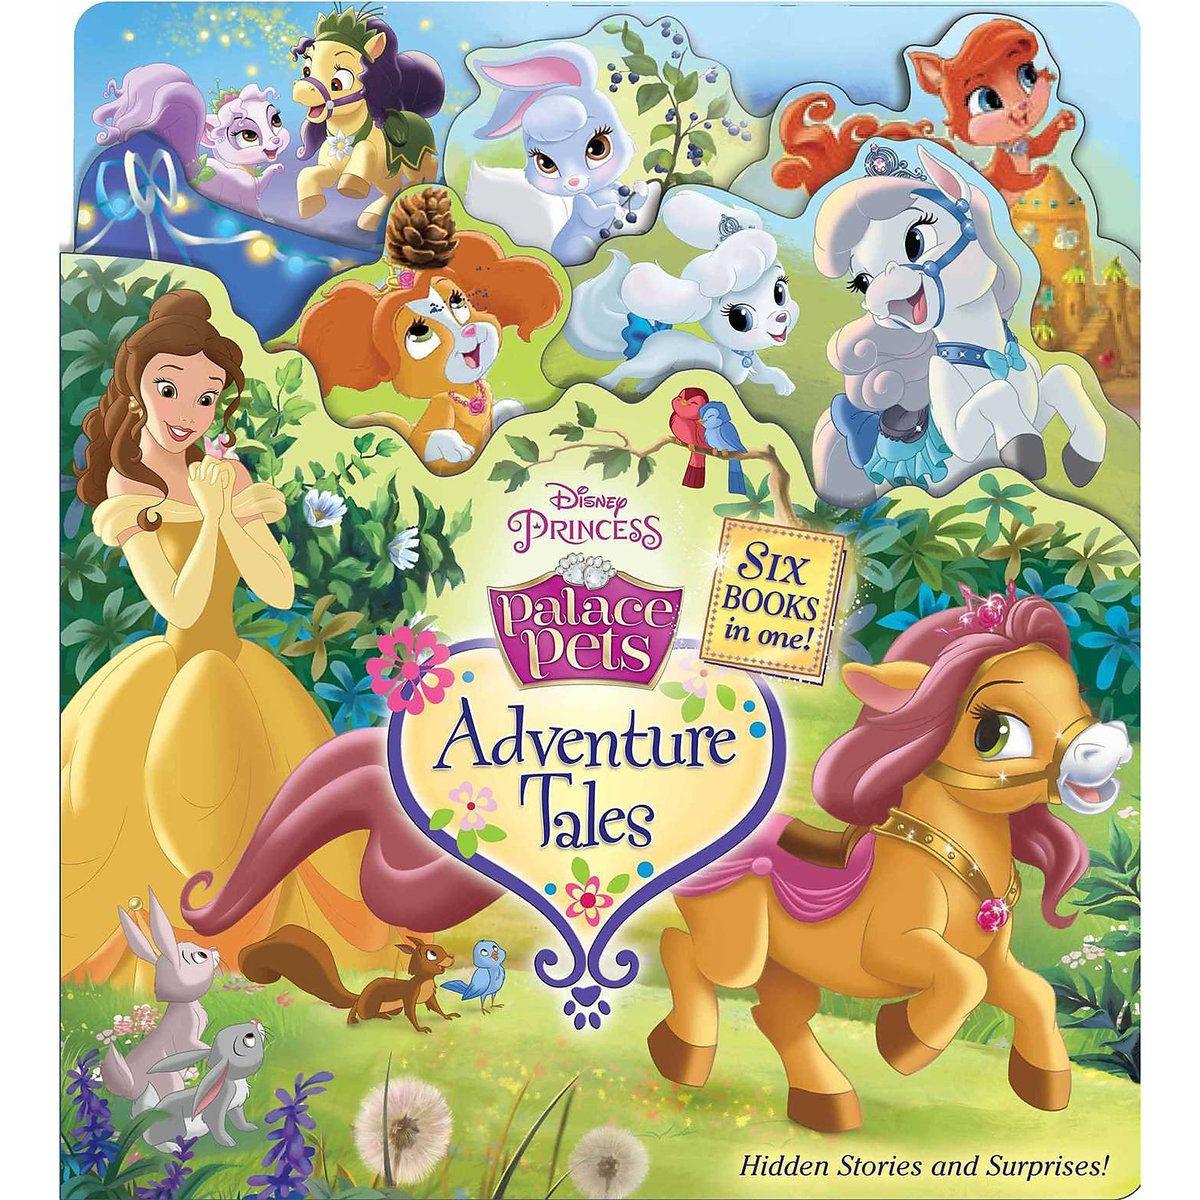 Palace Pets Adventure Tales Book Disney princess palace